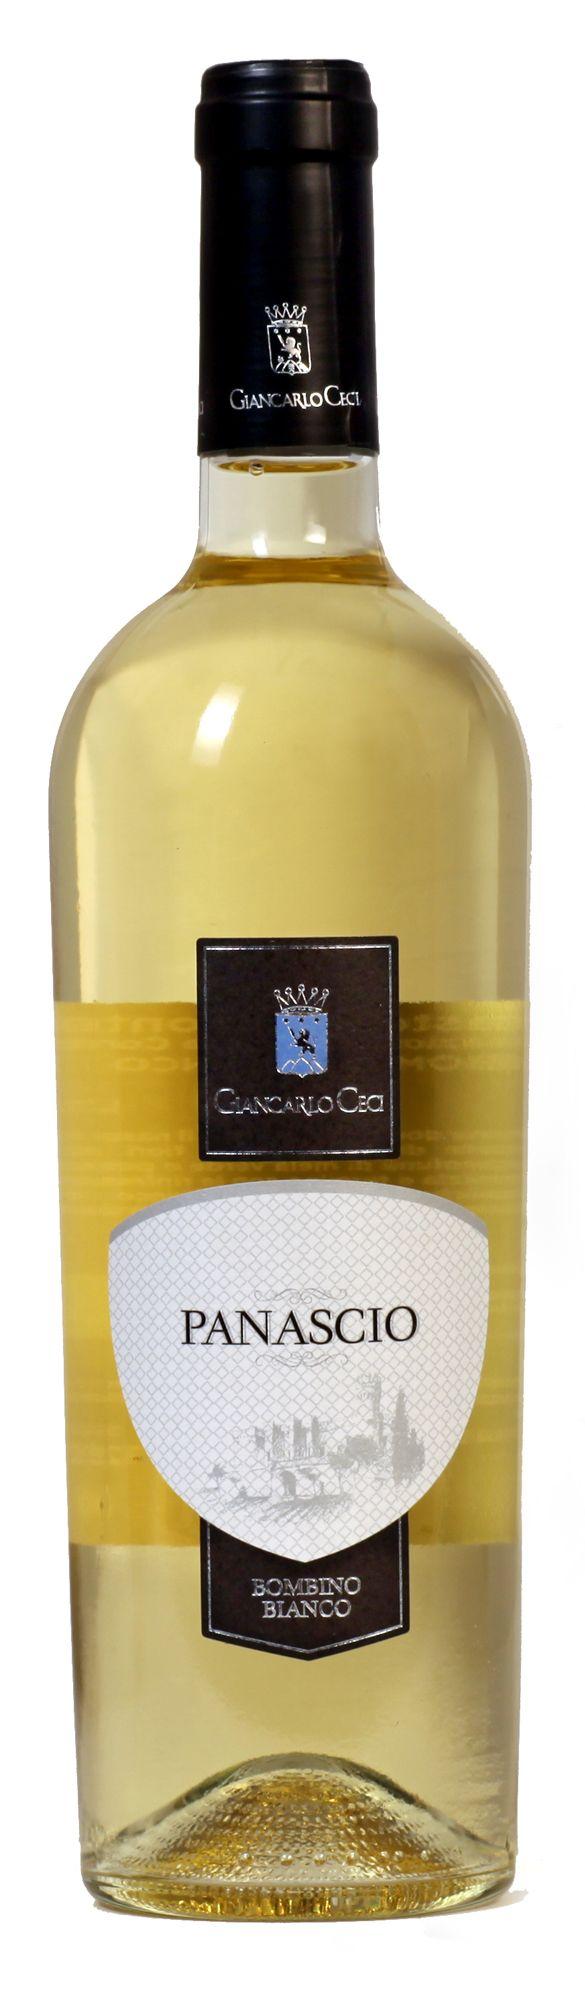 Agrinatura Giancarlo Ceci - Panascio - Vino Bianco